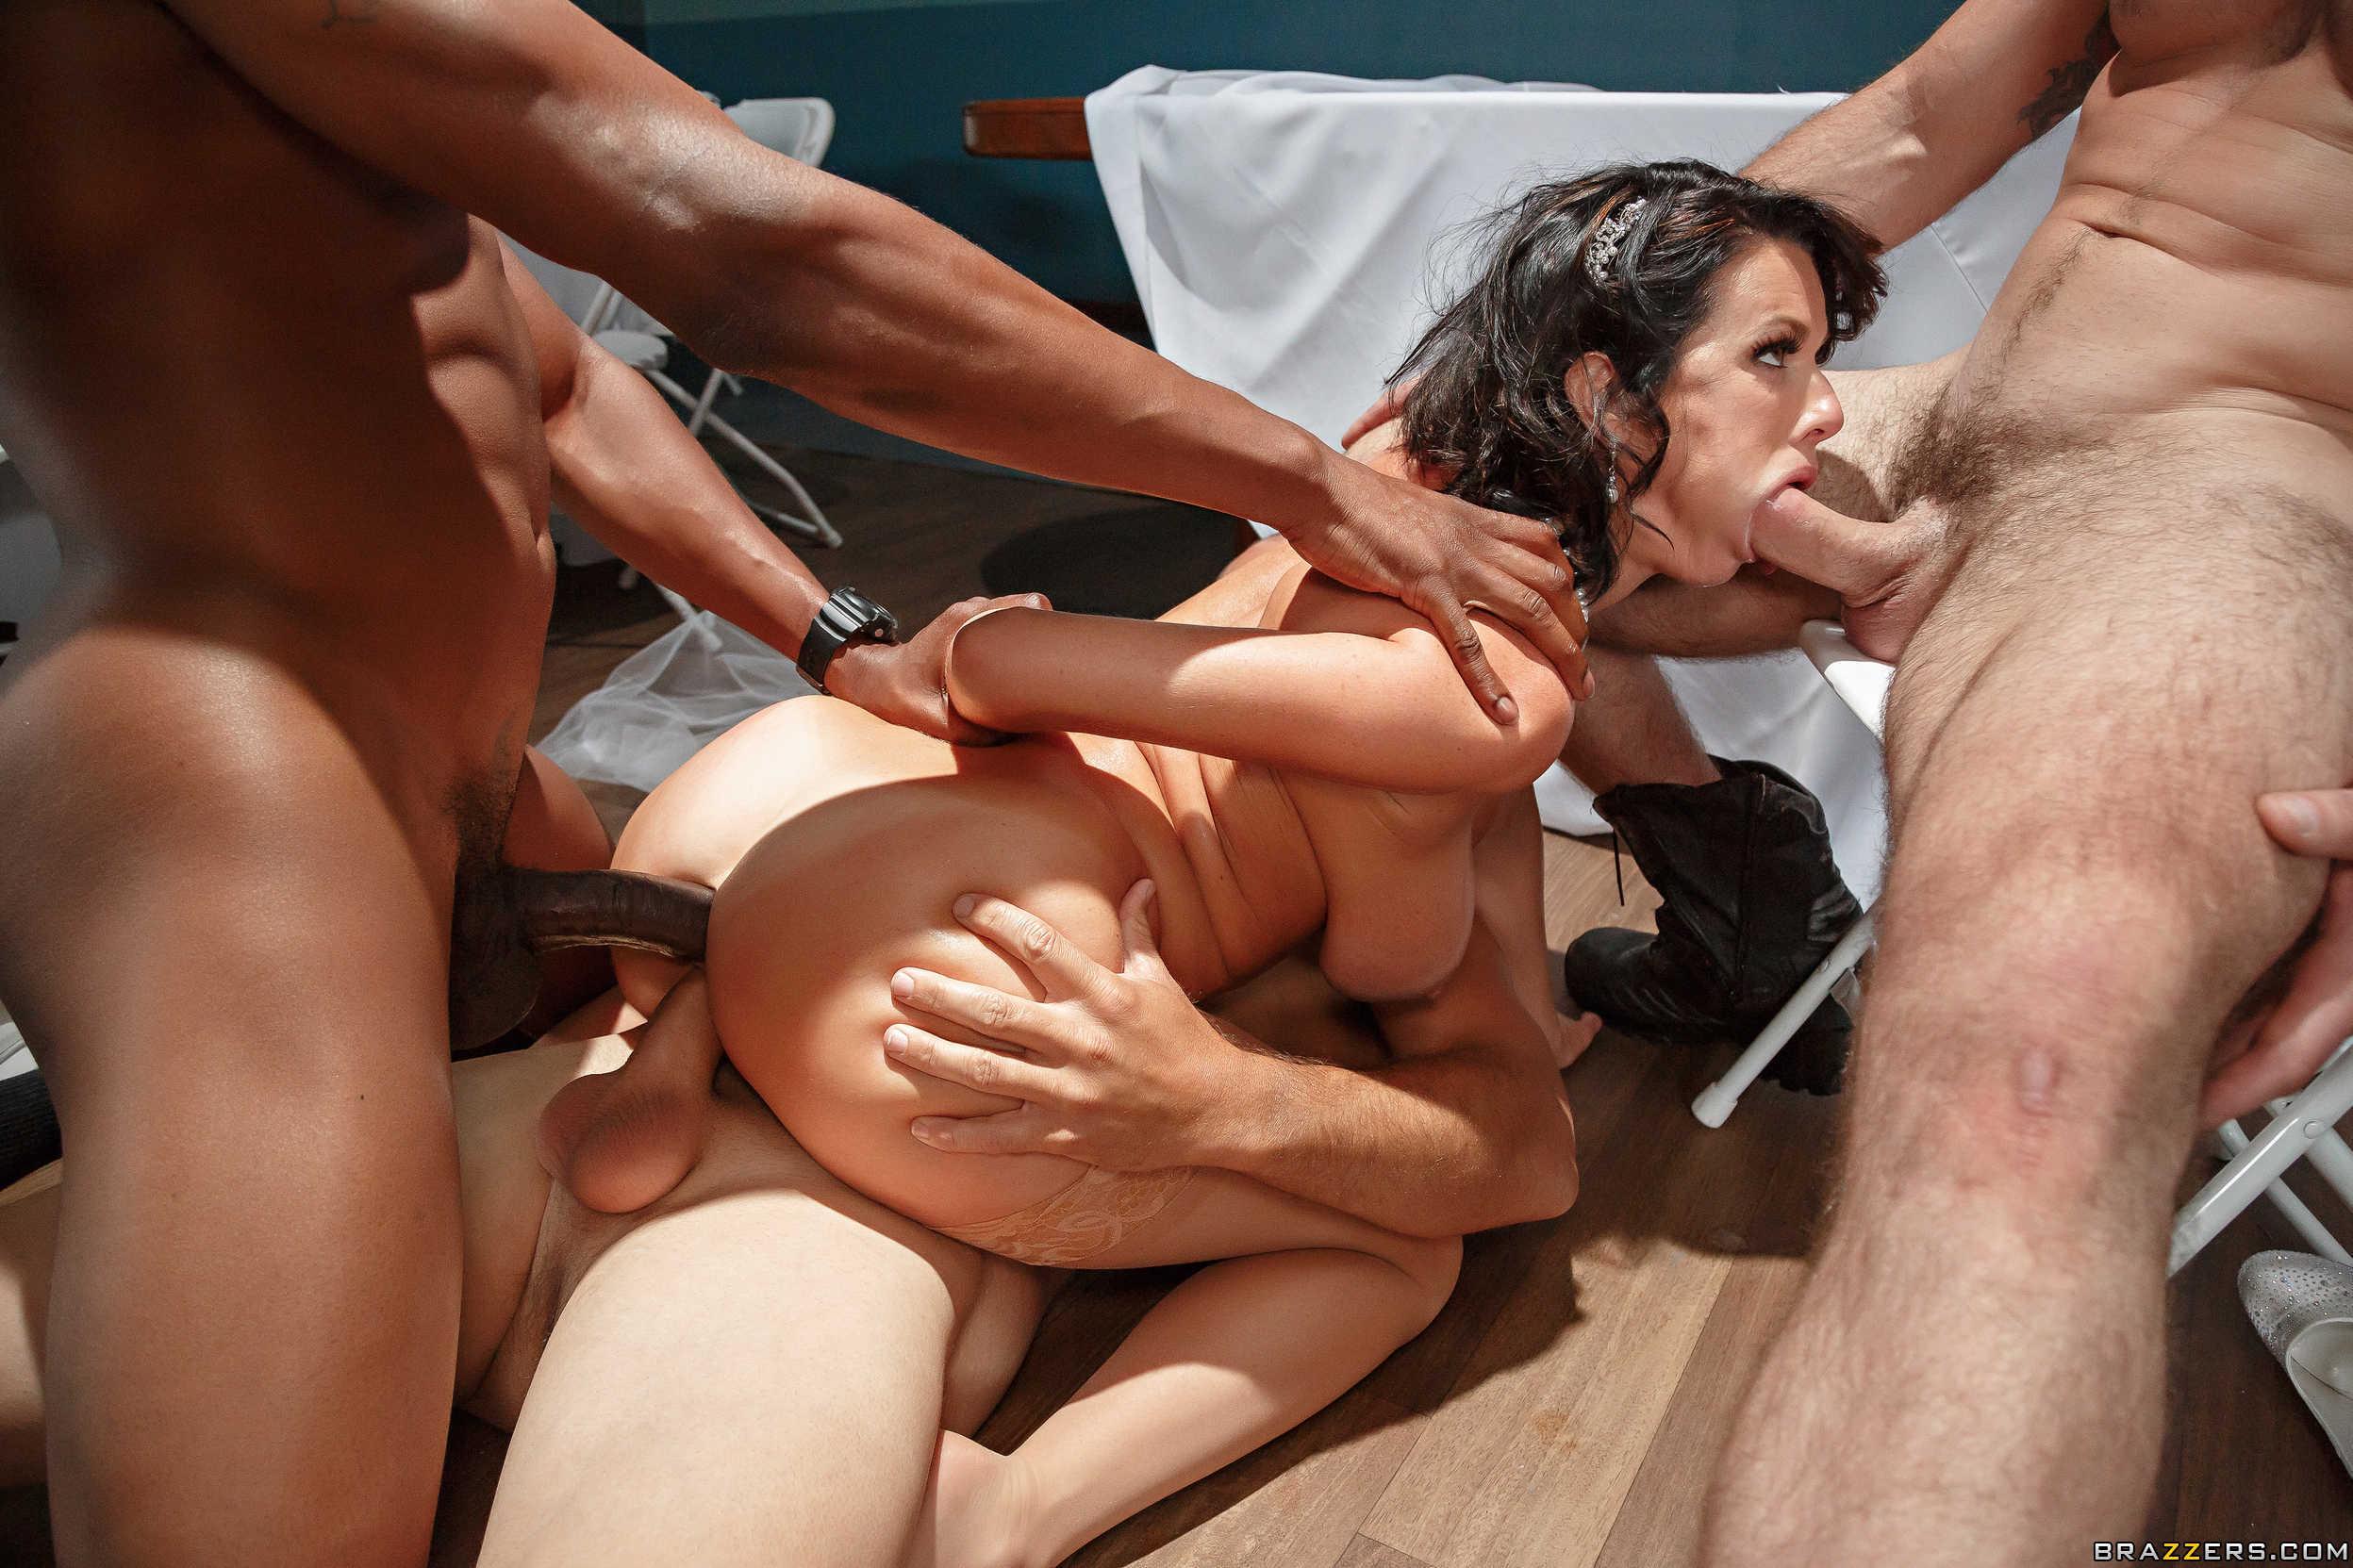 Very Horny Sinti And Roma Gangbang Compilation Tnaflix Porn Pics